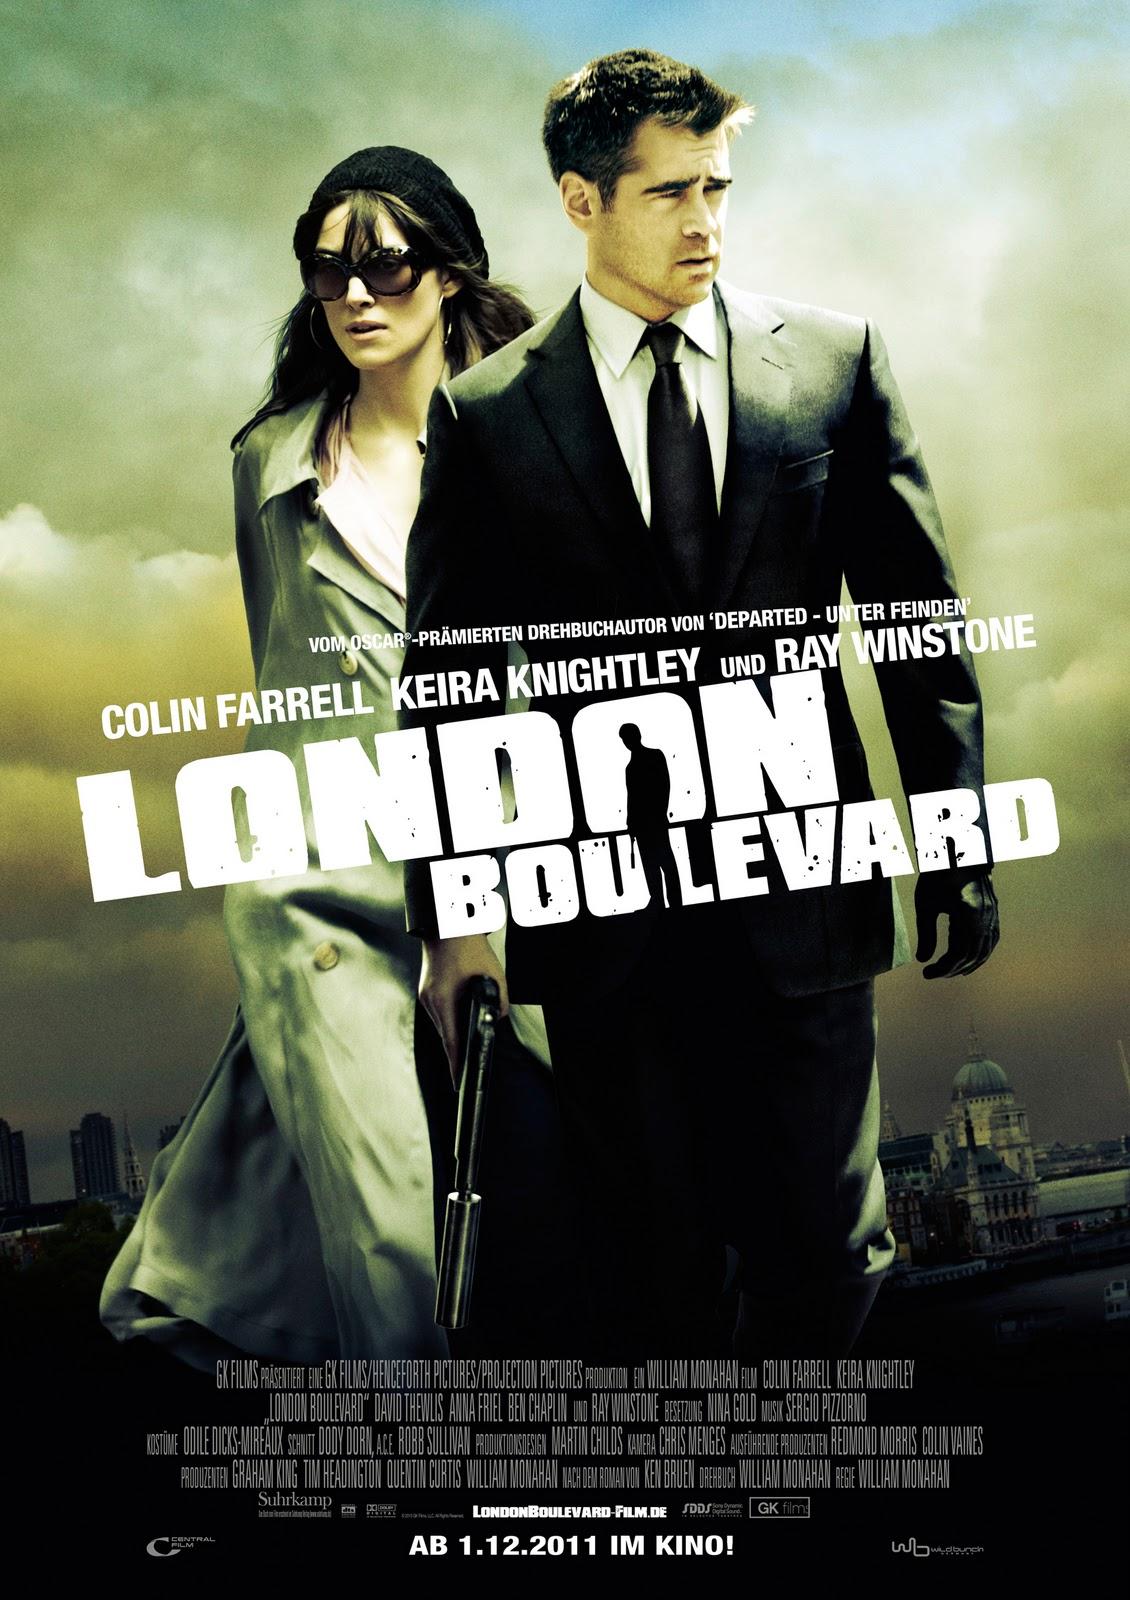 http://3.bp.blogspot.com/-HIYgQffrlE4/TpyQI8llR7I/AAAAAAAABpQ/Um-XbdyFeJM/s1600/London+Boulevard.jpg